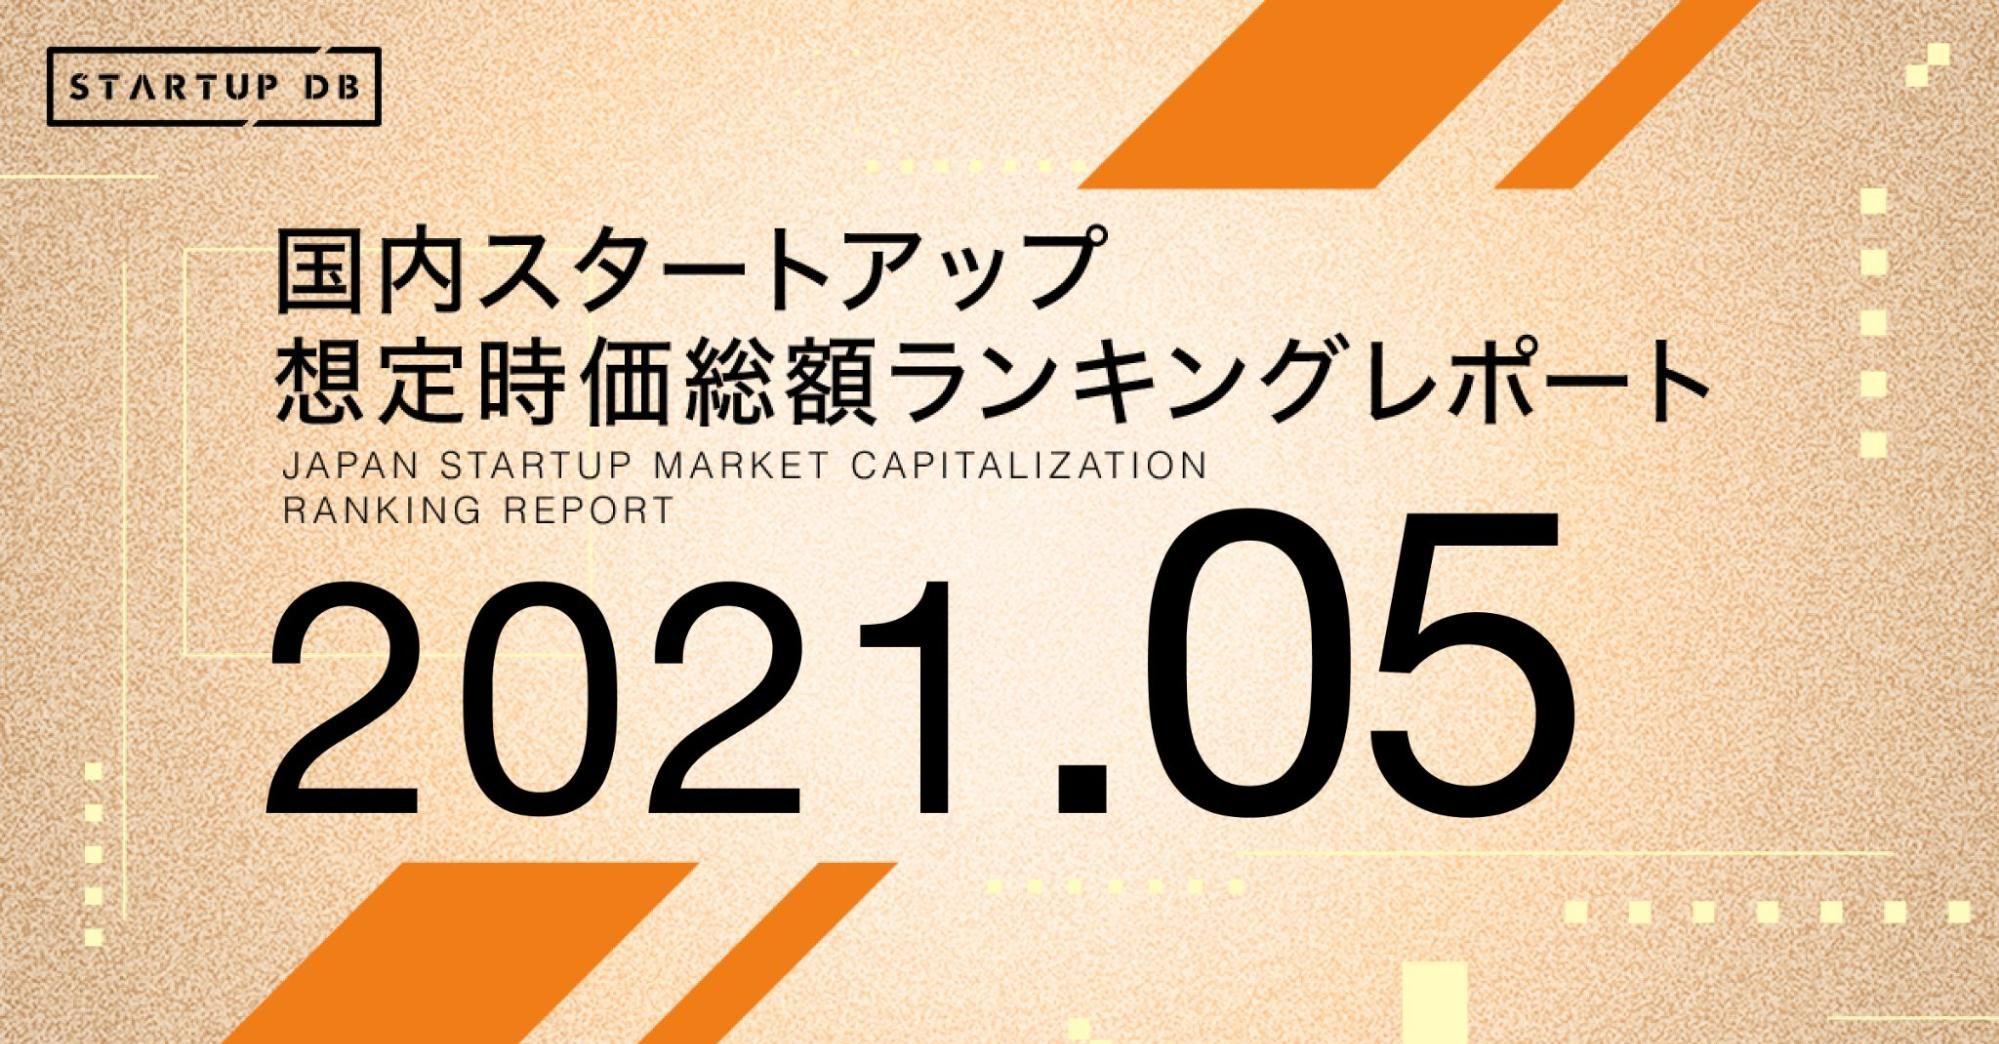 【STARTUP DB】調査結果 国内スタートアップ想定時価総額ランキング(2021年5月)